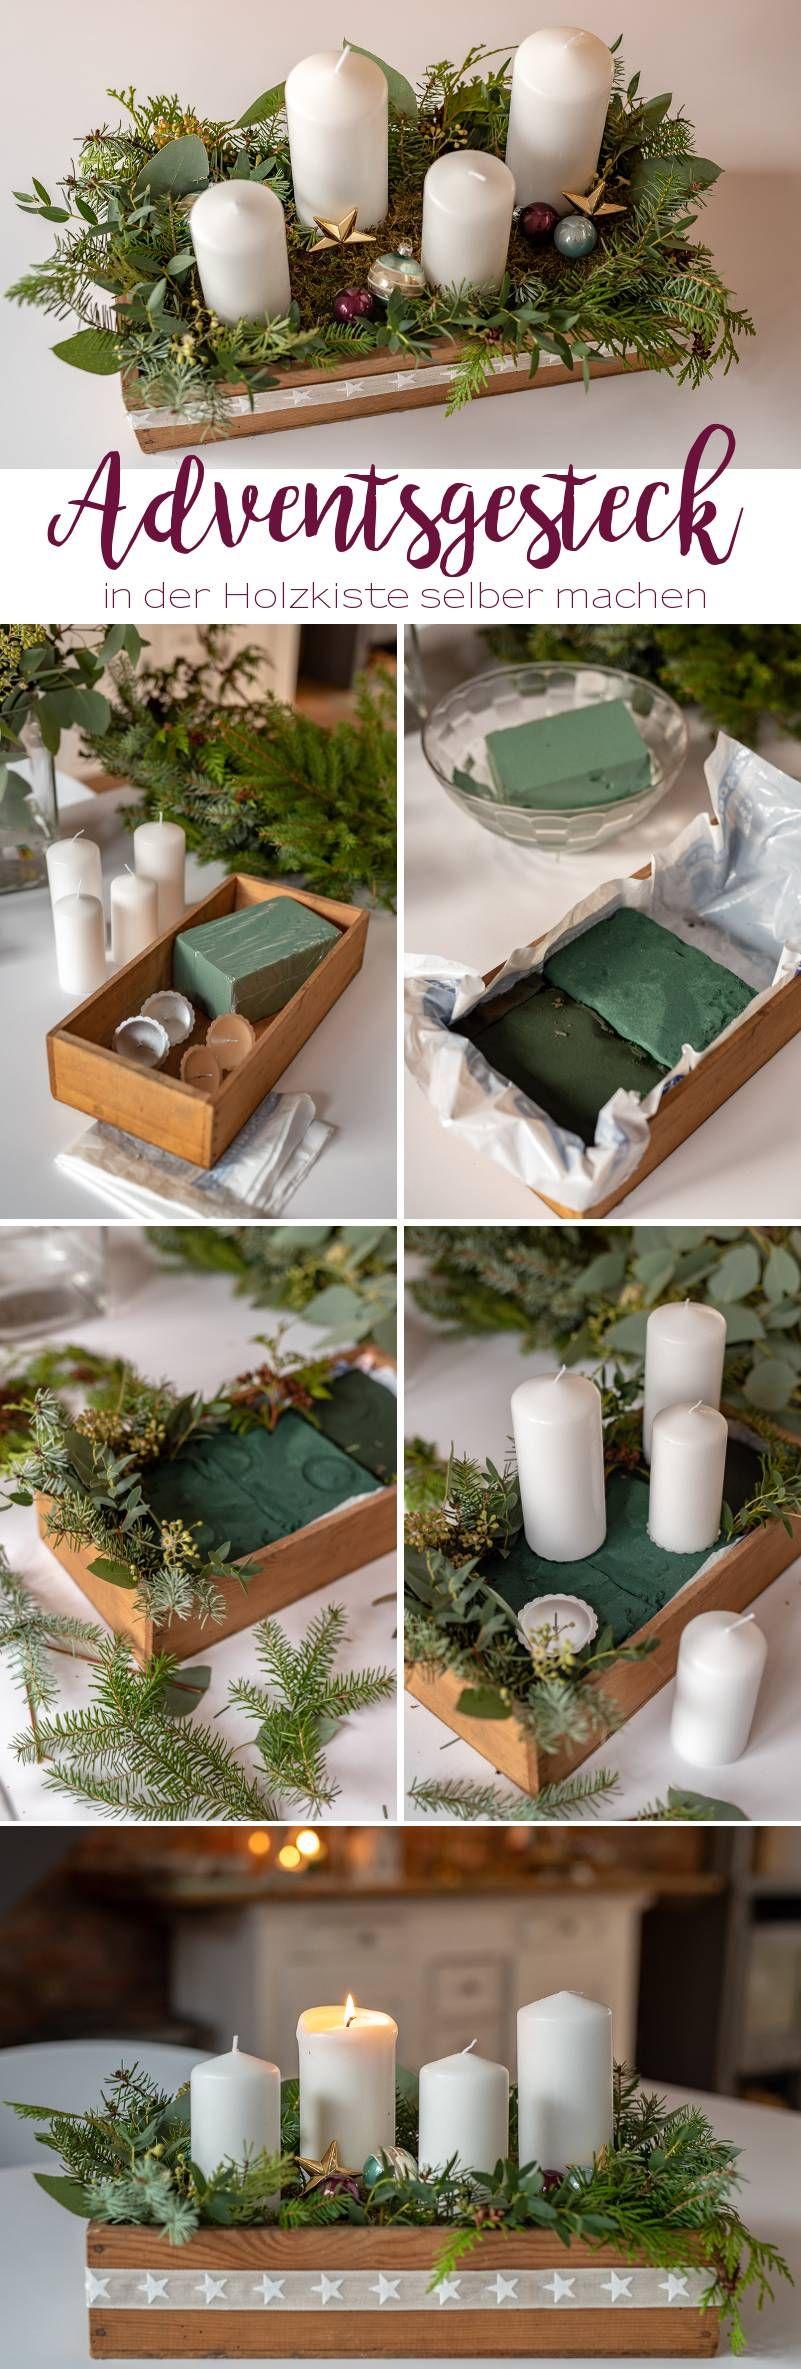 DIY Adventskranz: Adventsgesteck in der Holzkiste - Leelah Loves